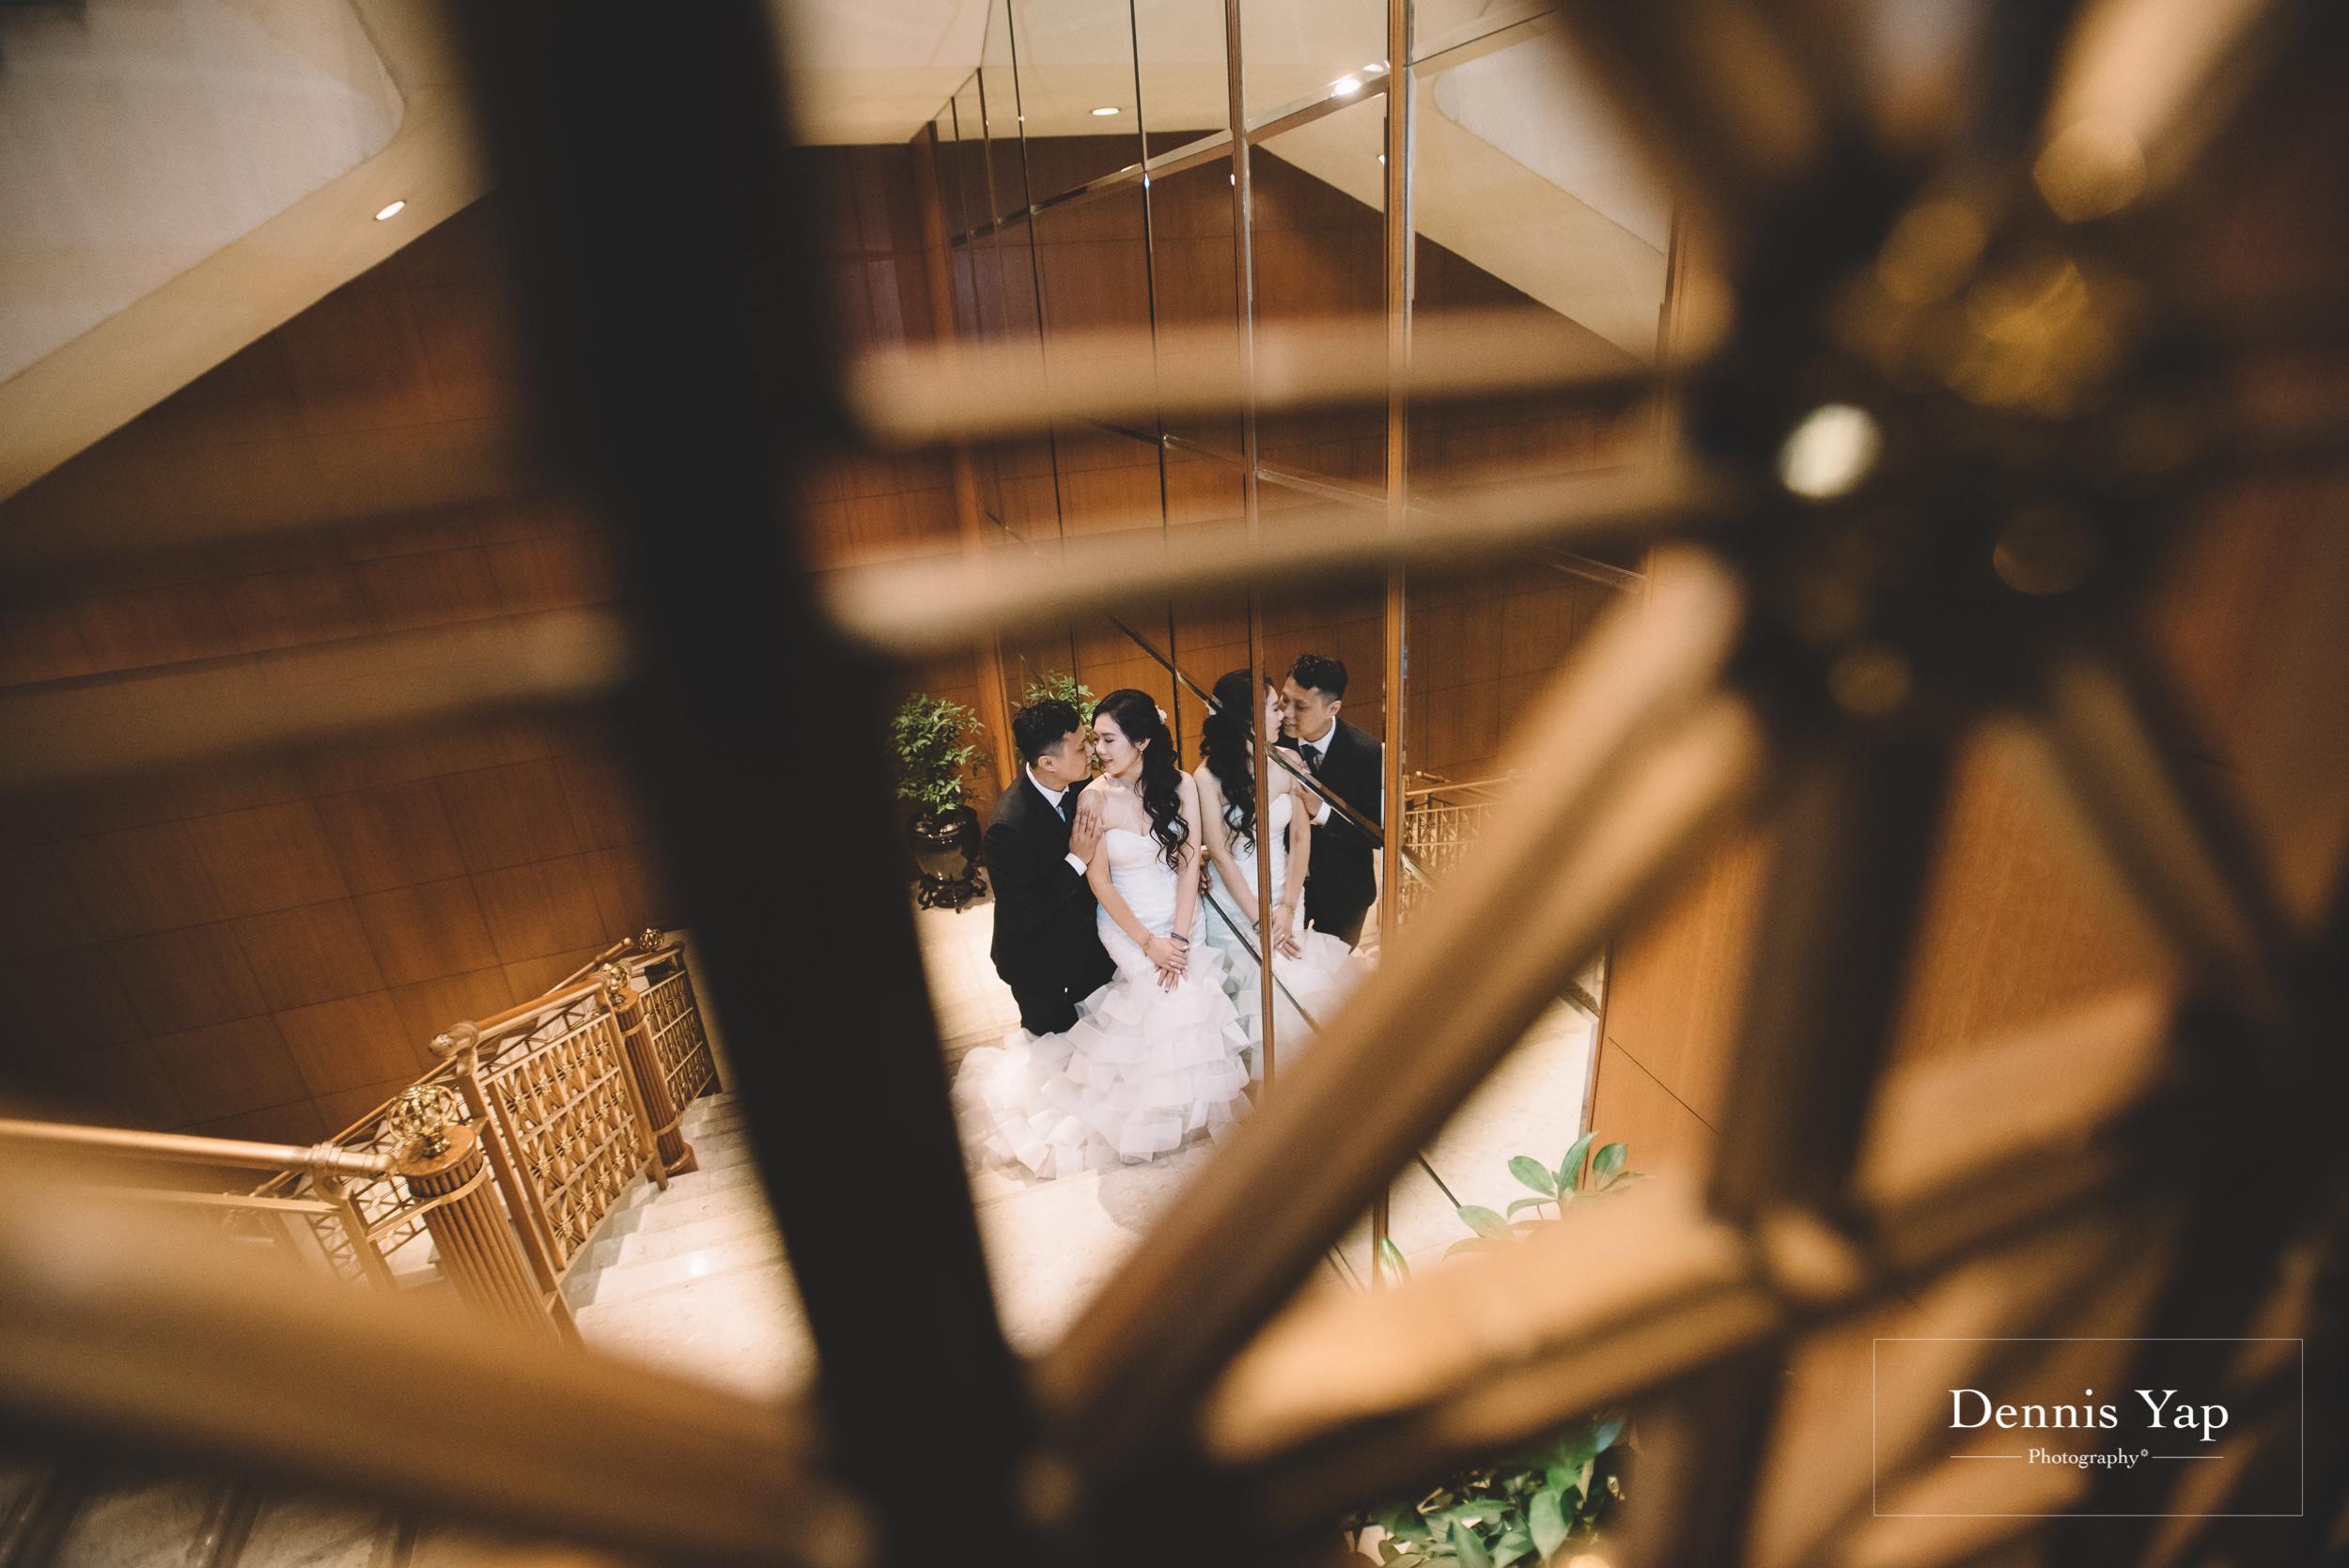 vincent peggy wedding dinner neo tamarind kuala lumpur dennis yap photography-5.jpg